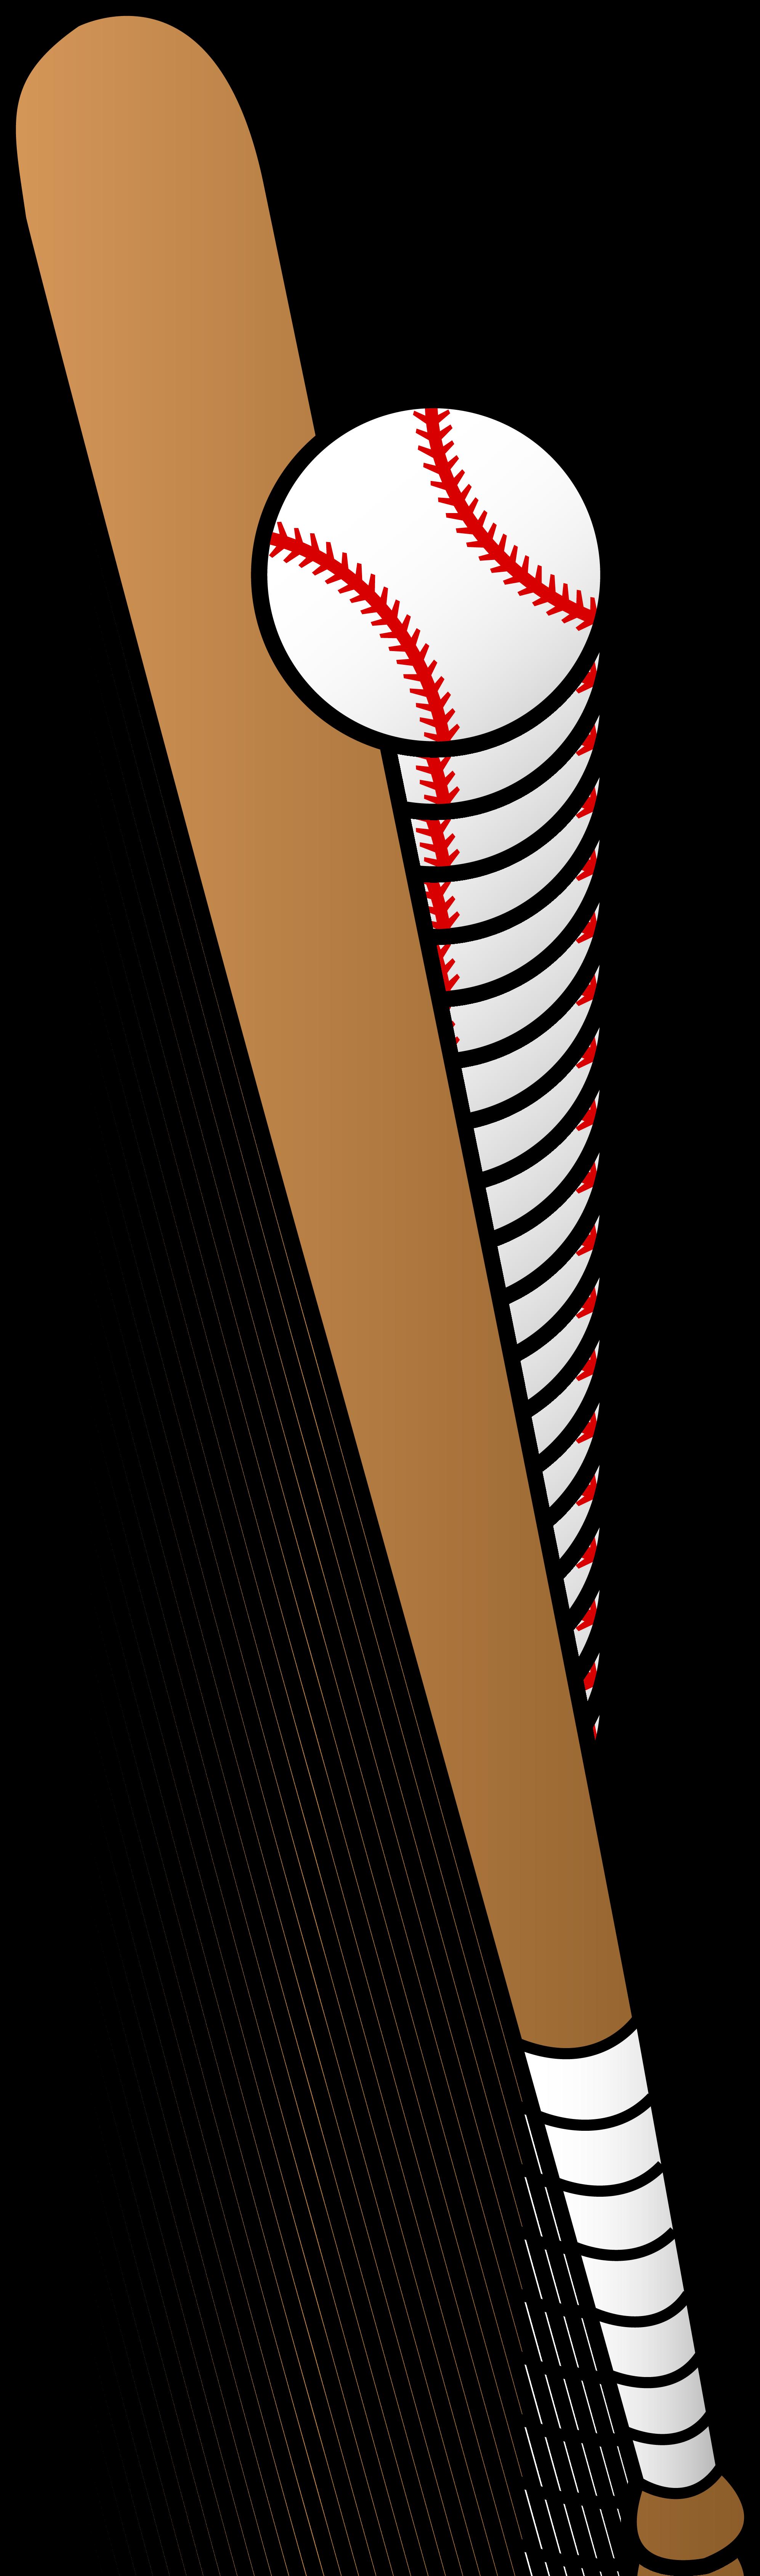 Baseball bat clip art.